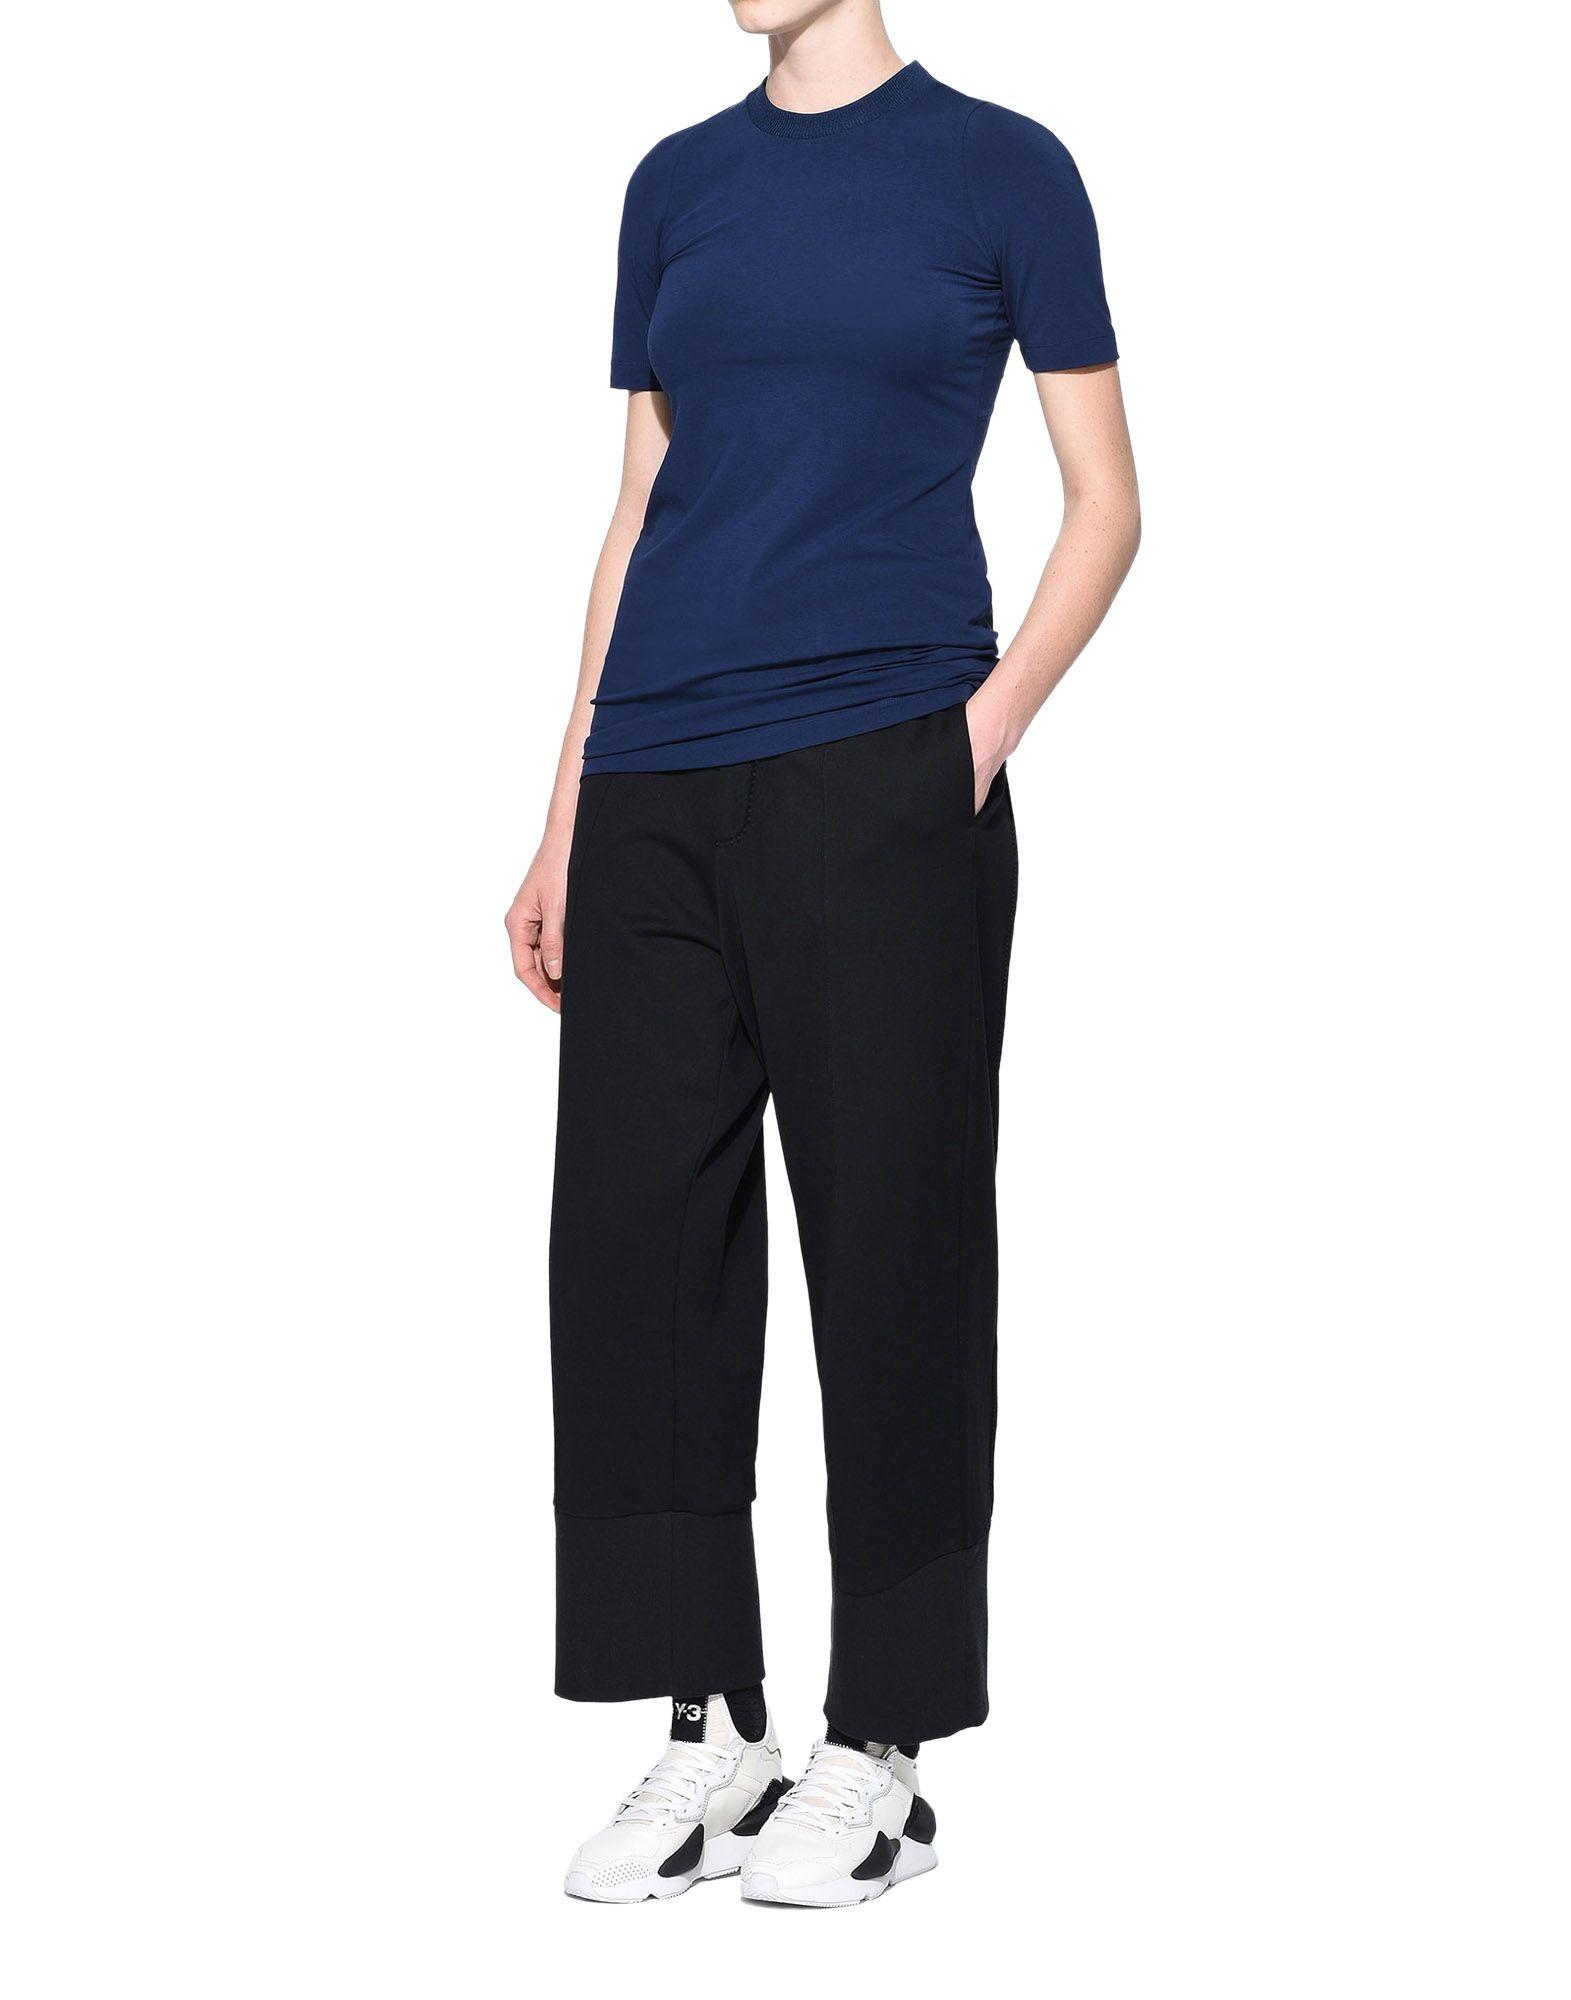 Y-3 Y-3 Prime Tee Short sleeve t-shirt Woman a